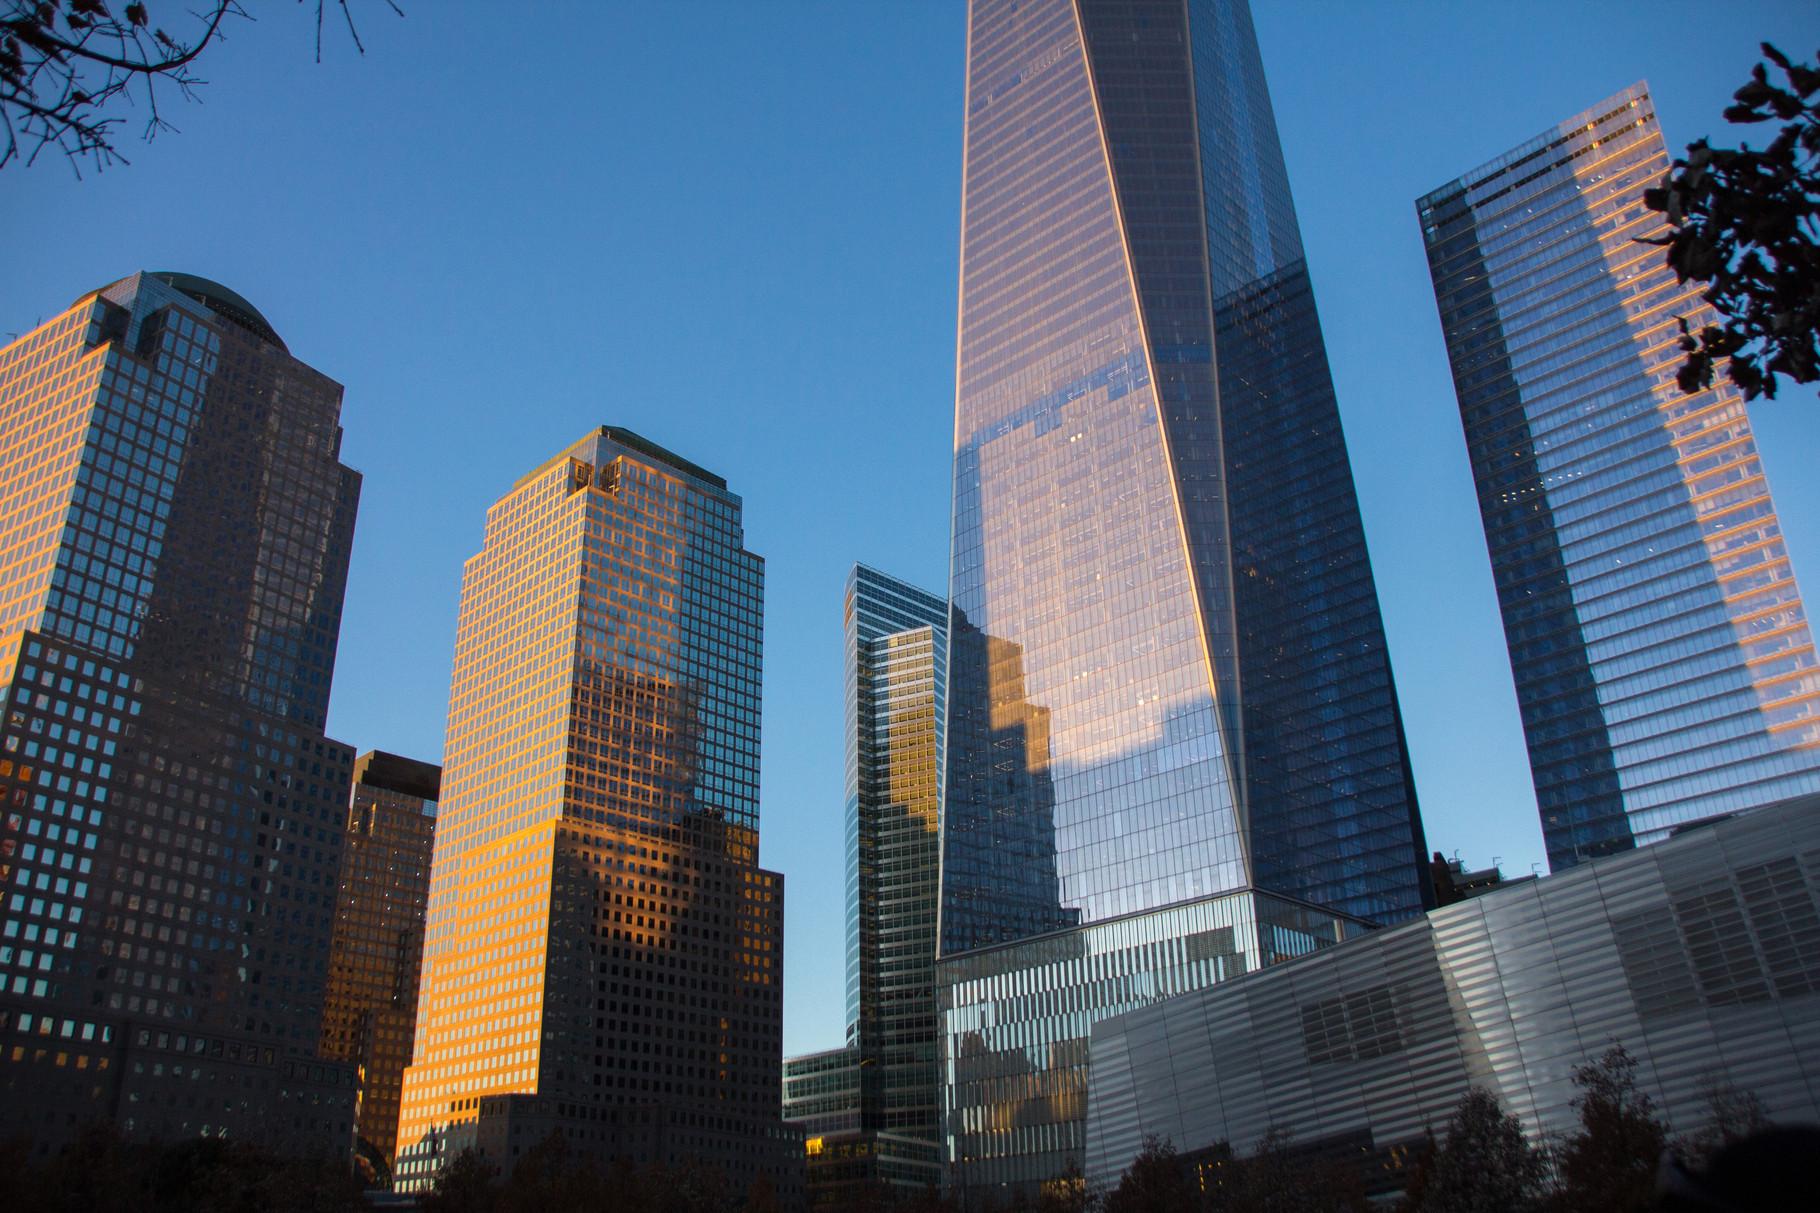 20_NYC World Trade Center.